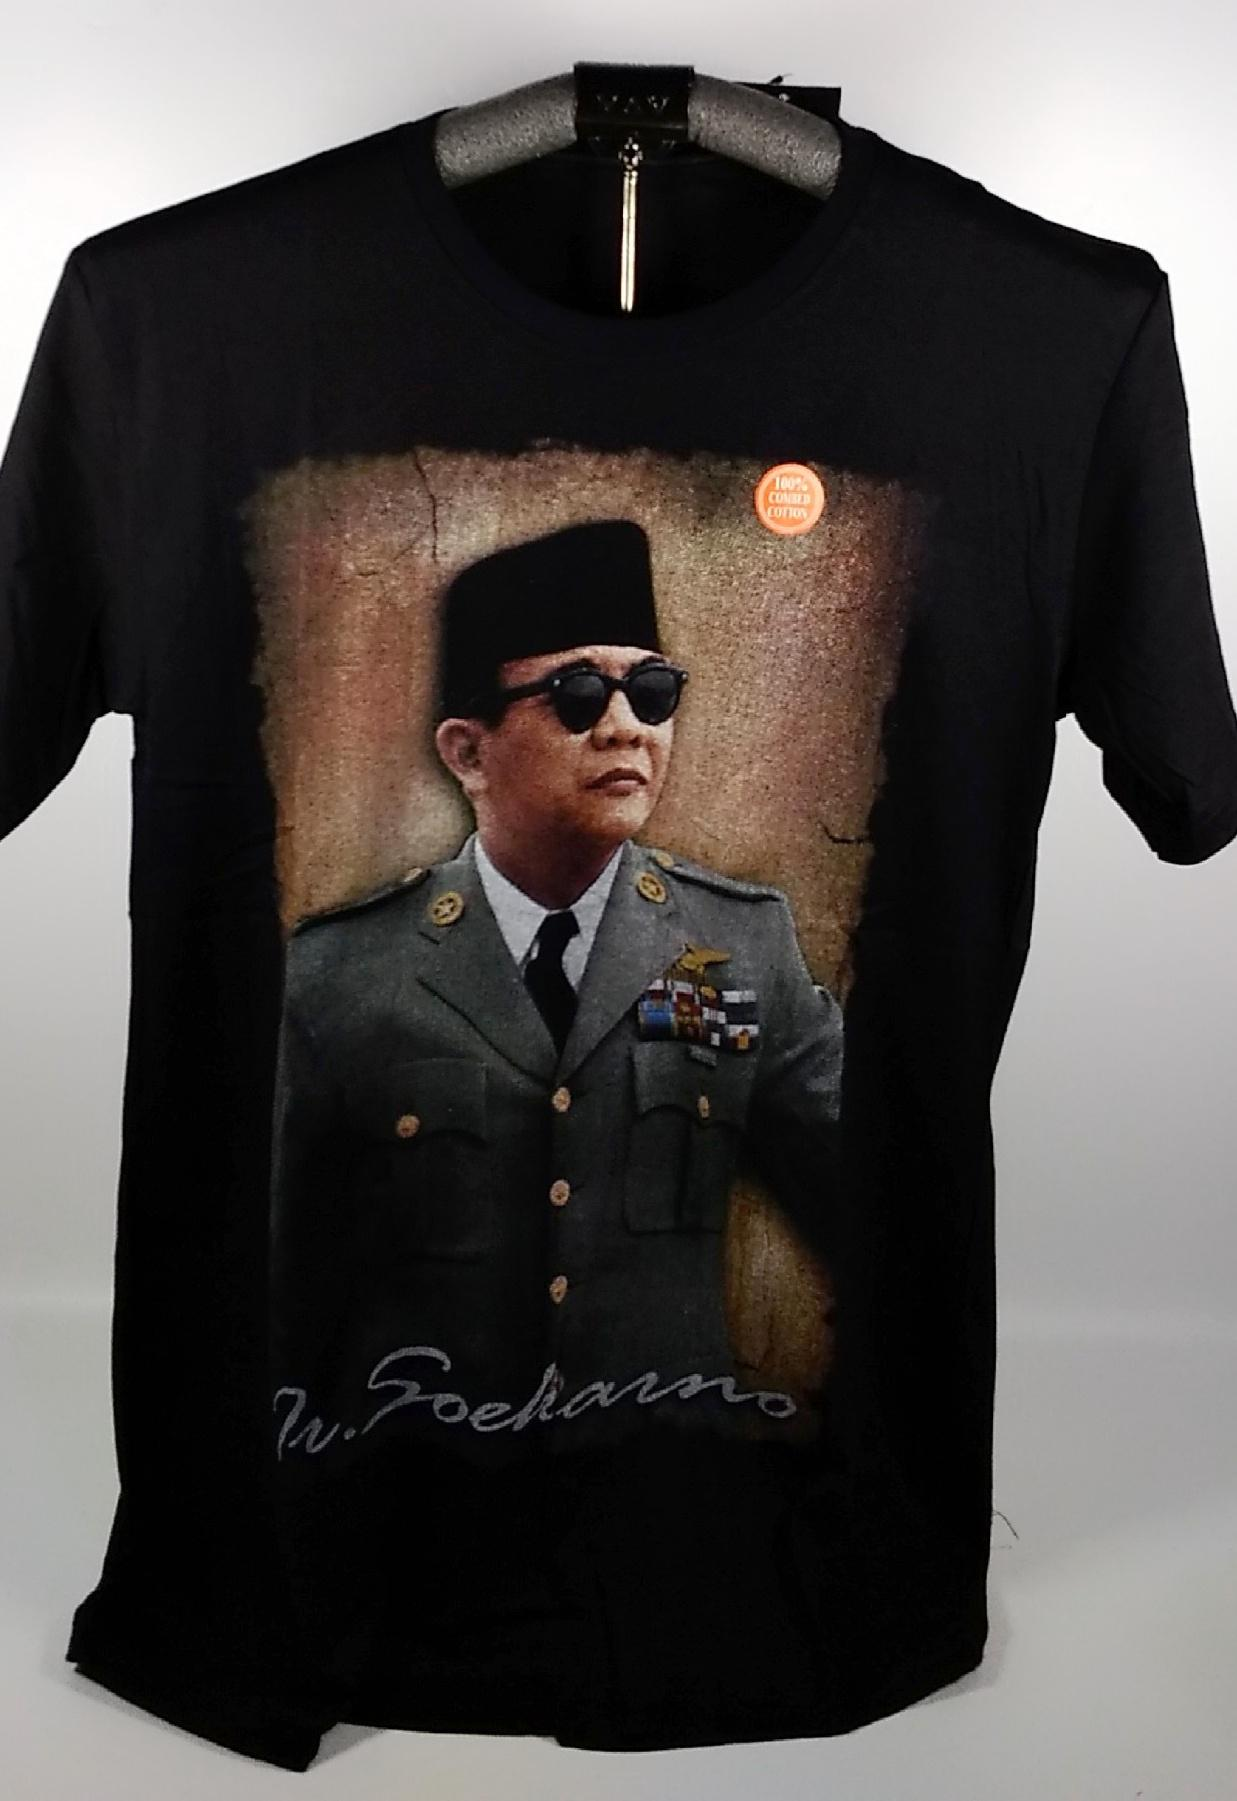 Update Paling Lengkap Himpunan Peraturan Presiden Tentang Voucher Alfamart 100ribu2802 Kaos Soekarno